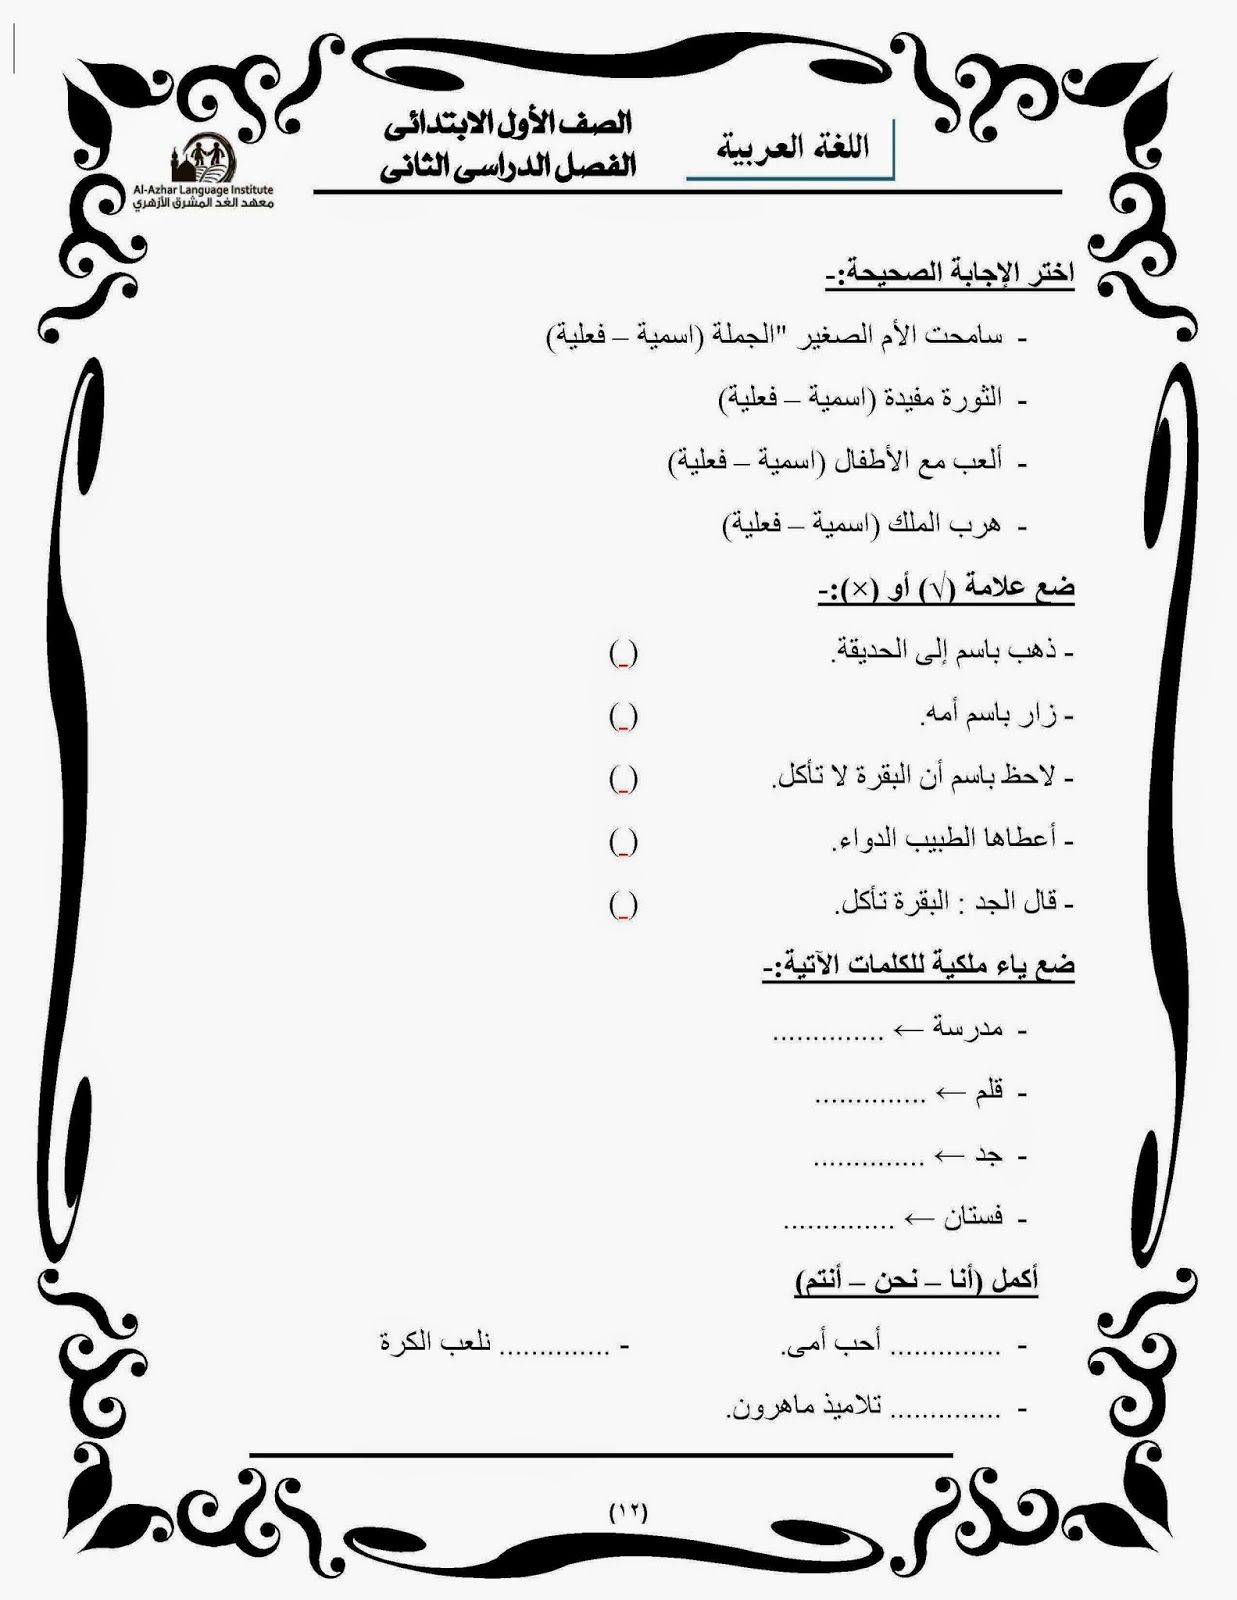 hight resolution of Urdu Grammar Worksheet Grade 1   Printable Worksheets and Activities for  Teachers